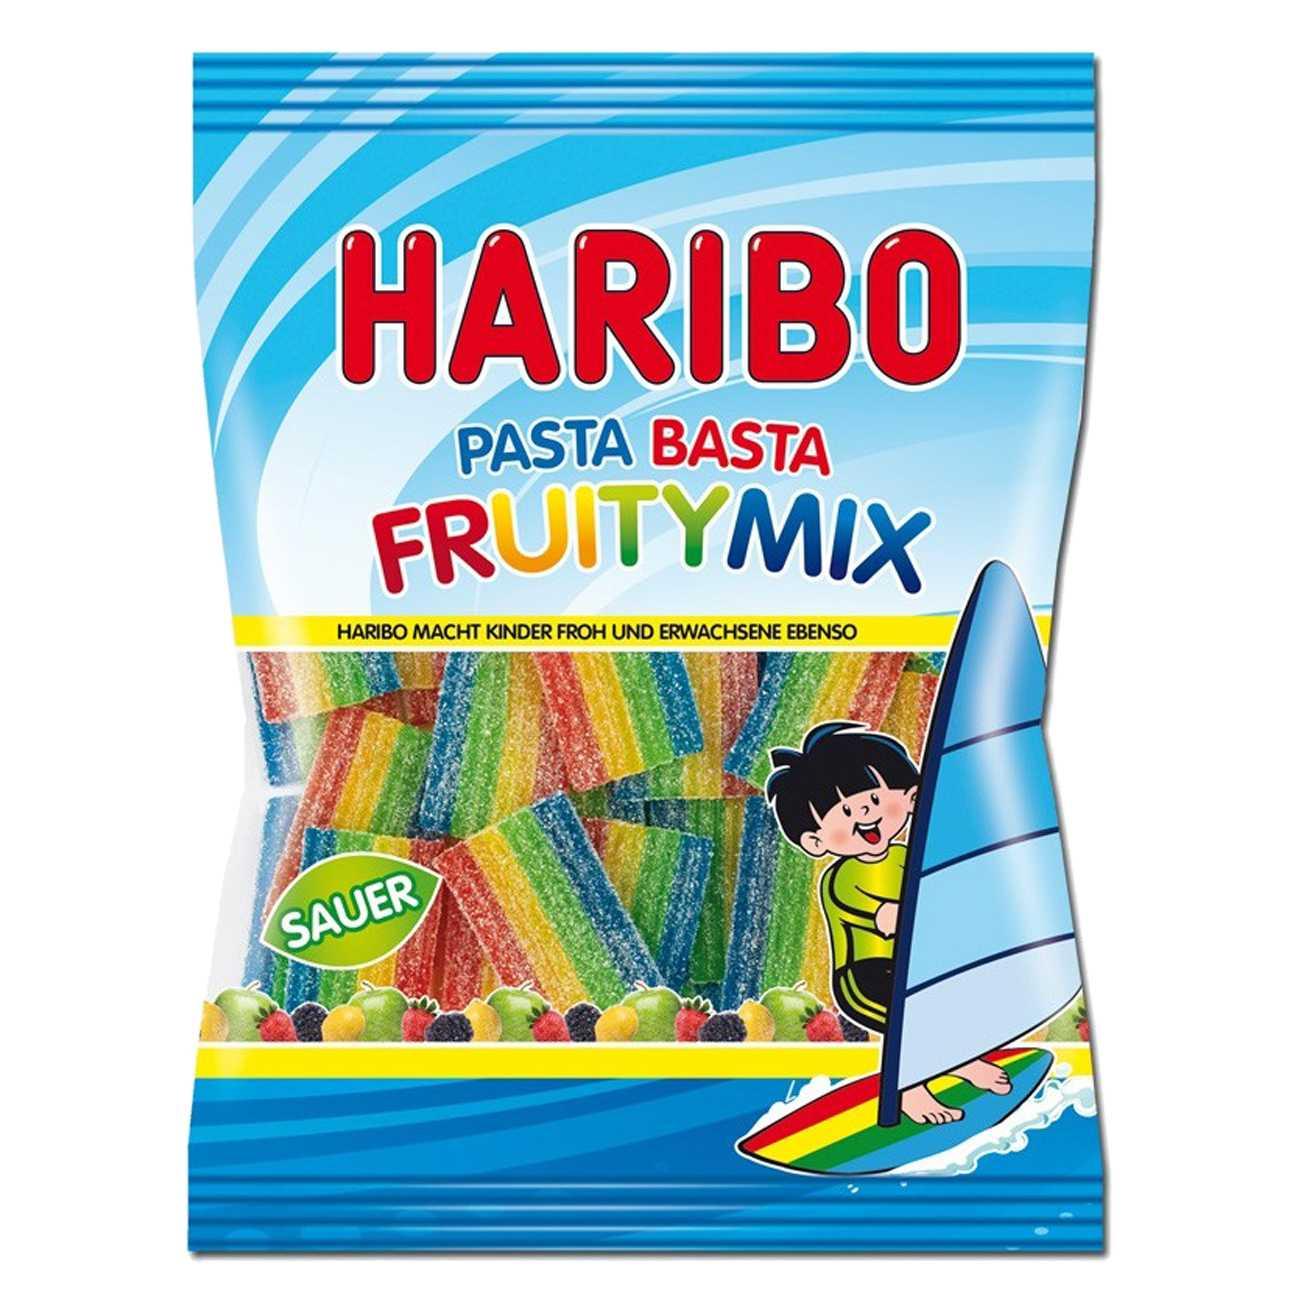 PASTA BASTA FRUITY MIX 450 G